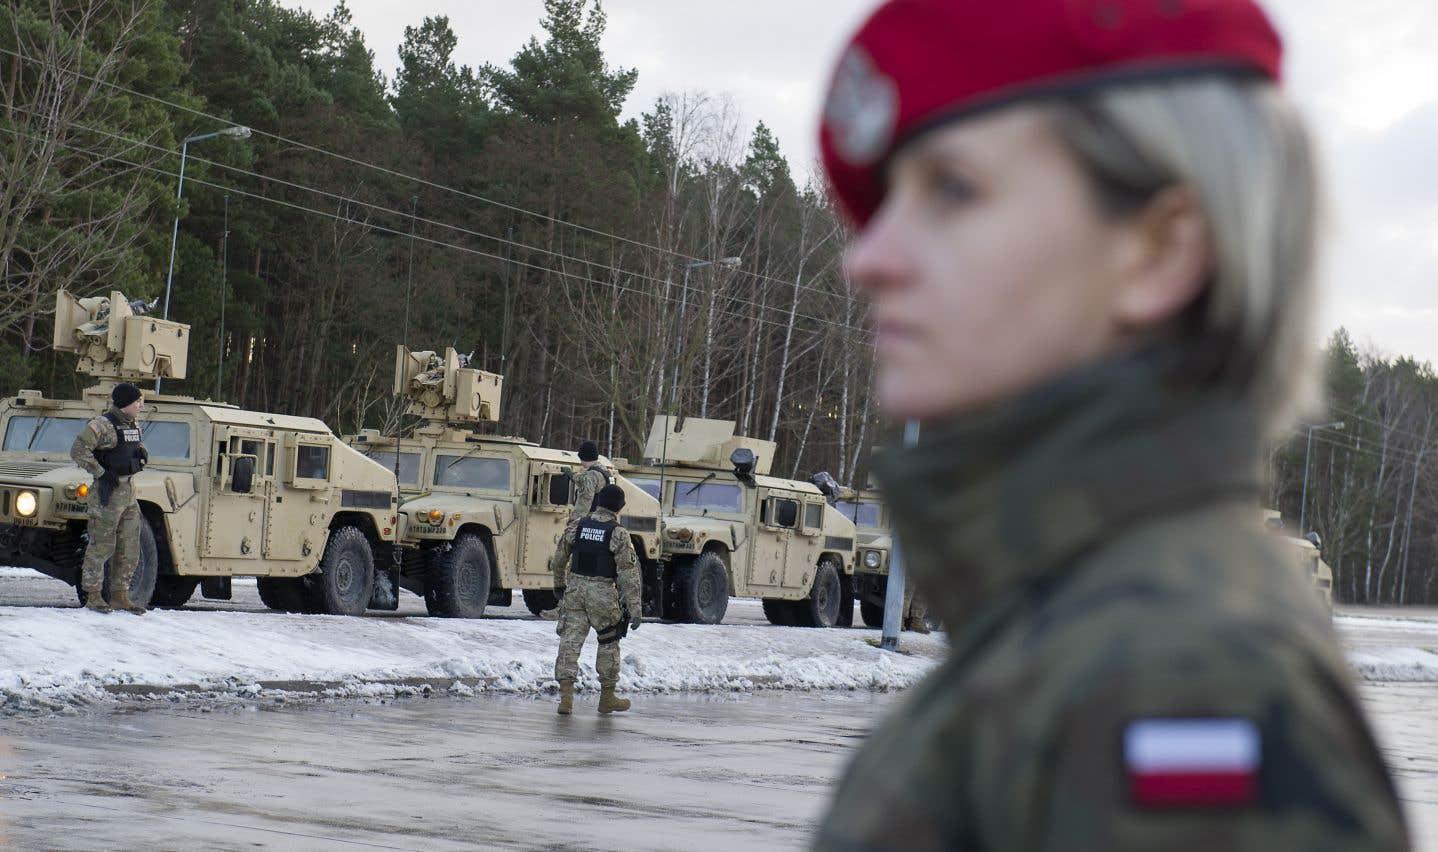 L'isolationnisme s'invite à Davos